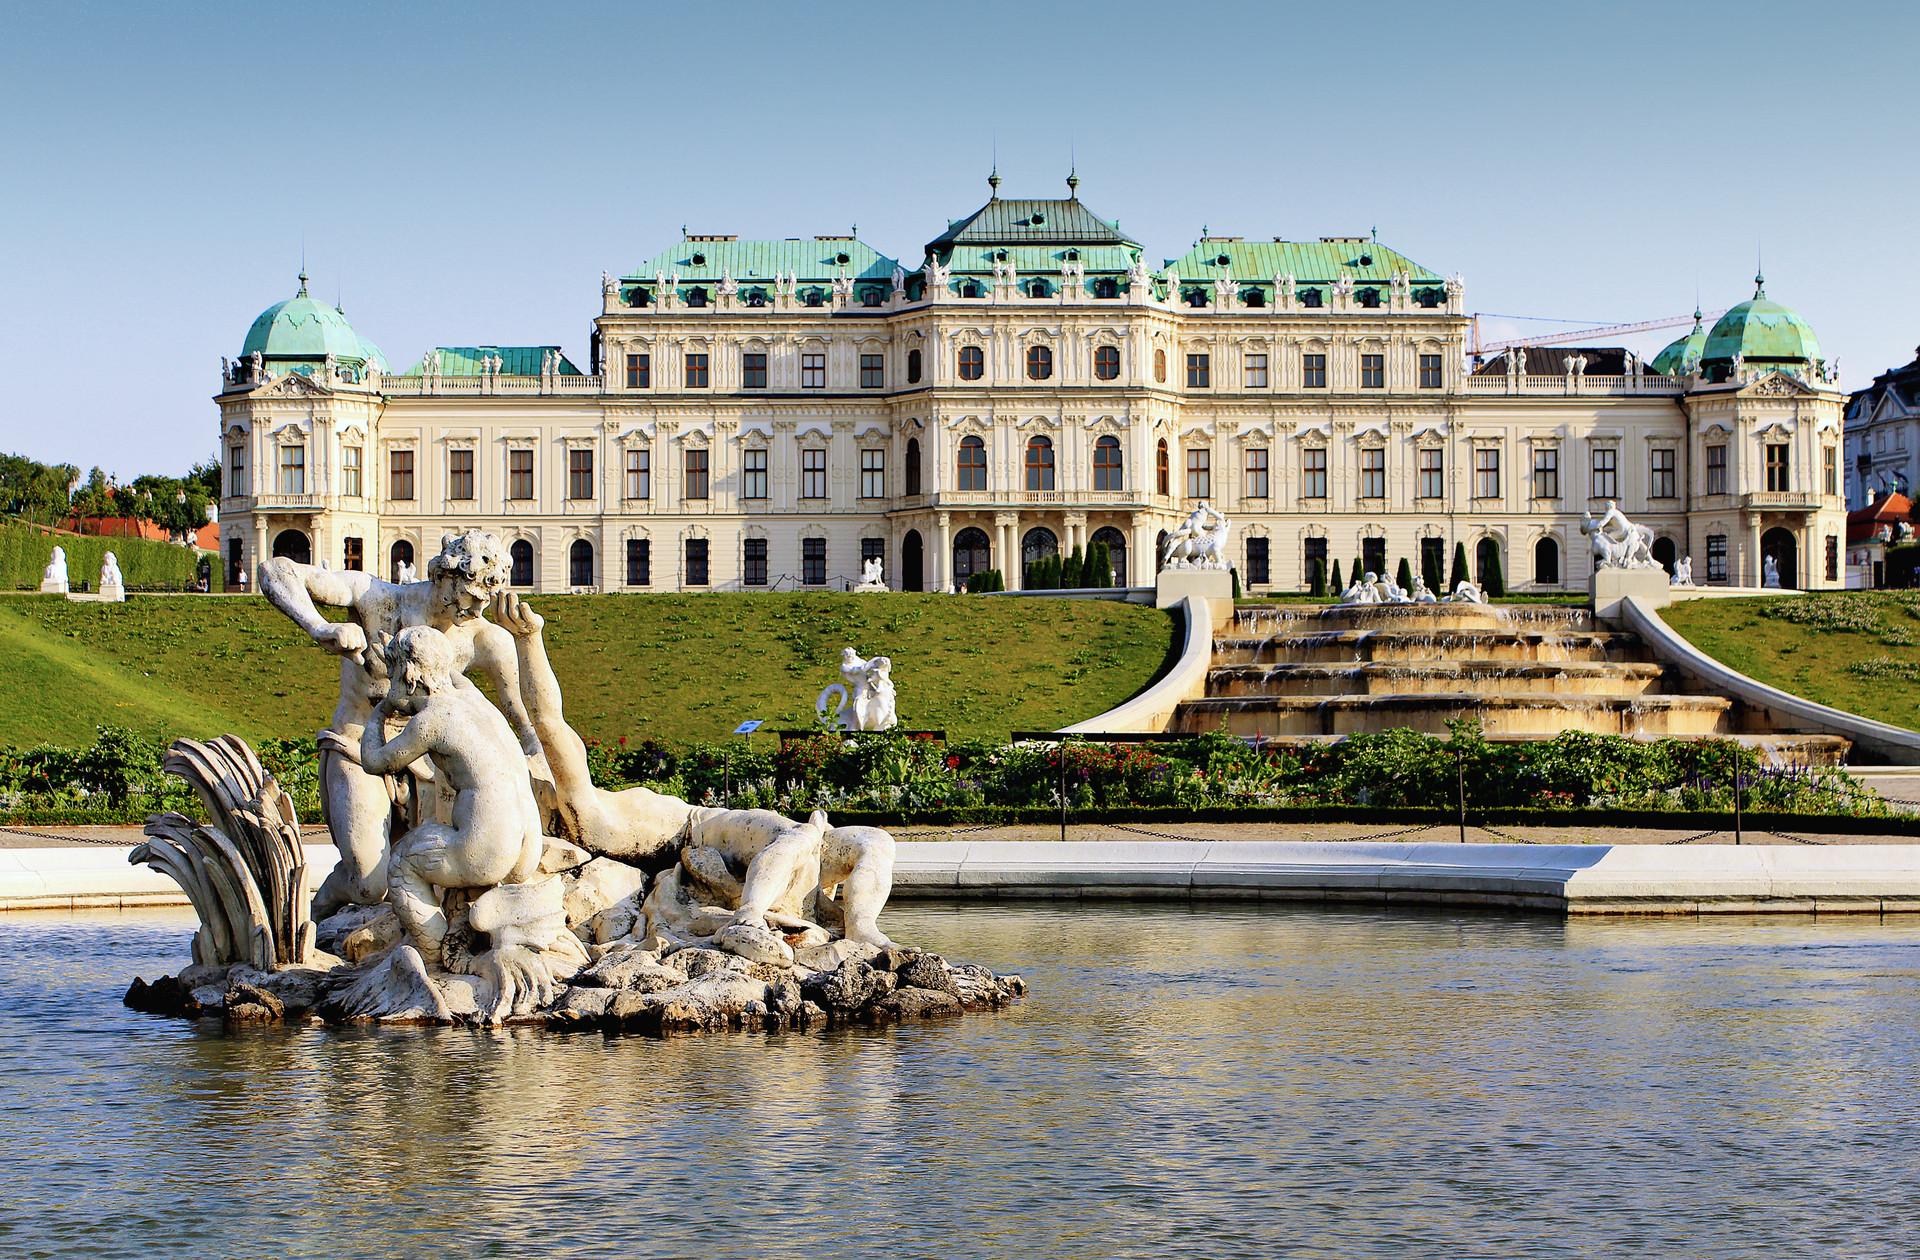 Experiência de Erasmus em Viena, Áustria, por Svetla